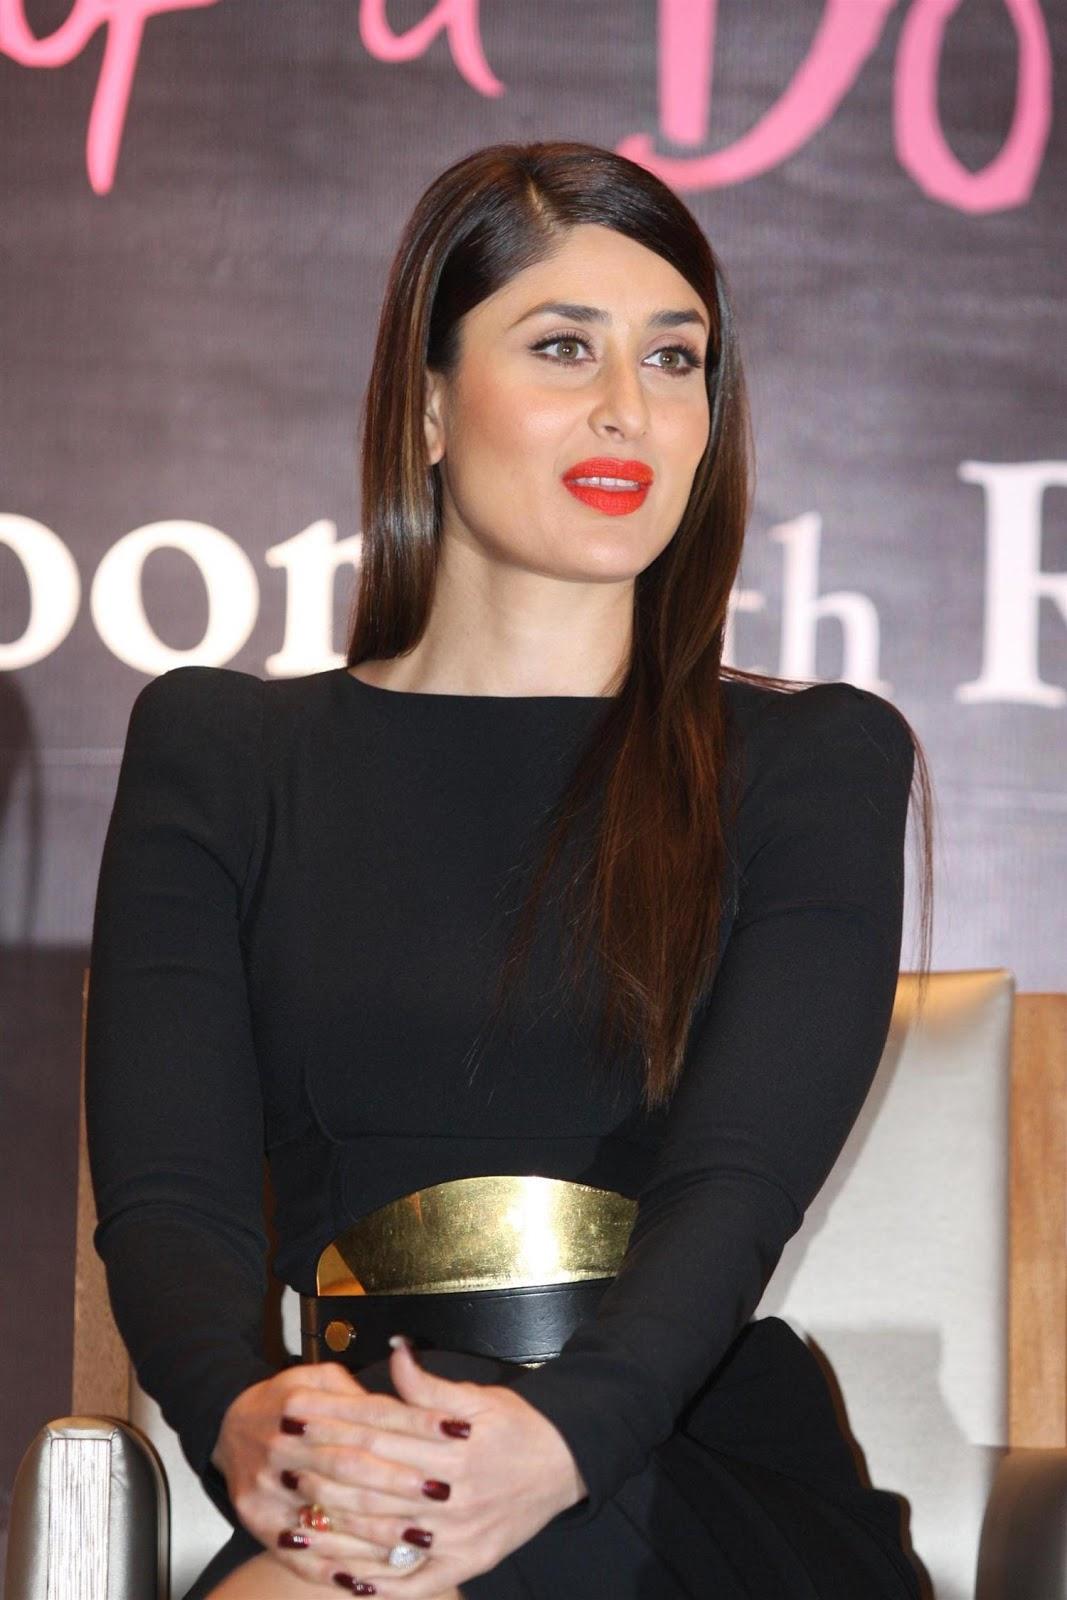 Kareena Kapoor HD Pictures | HD Wallpapers of Kareena Kapoor